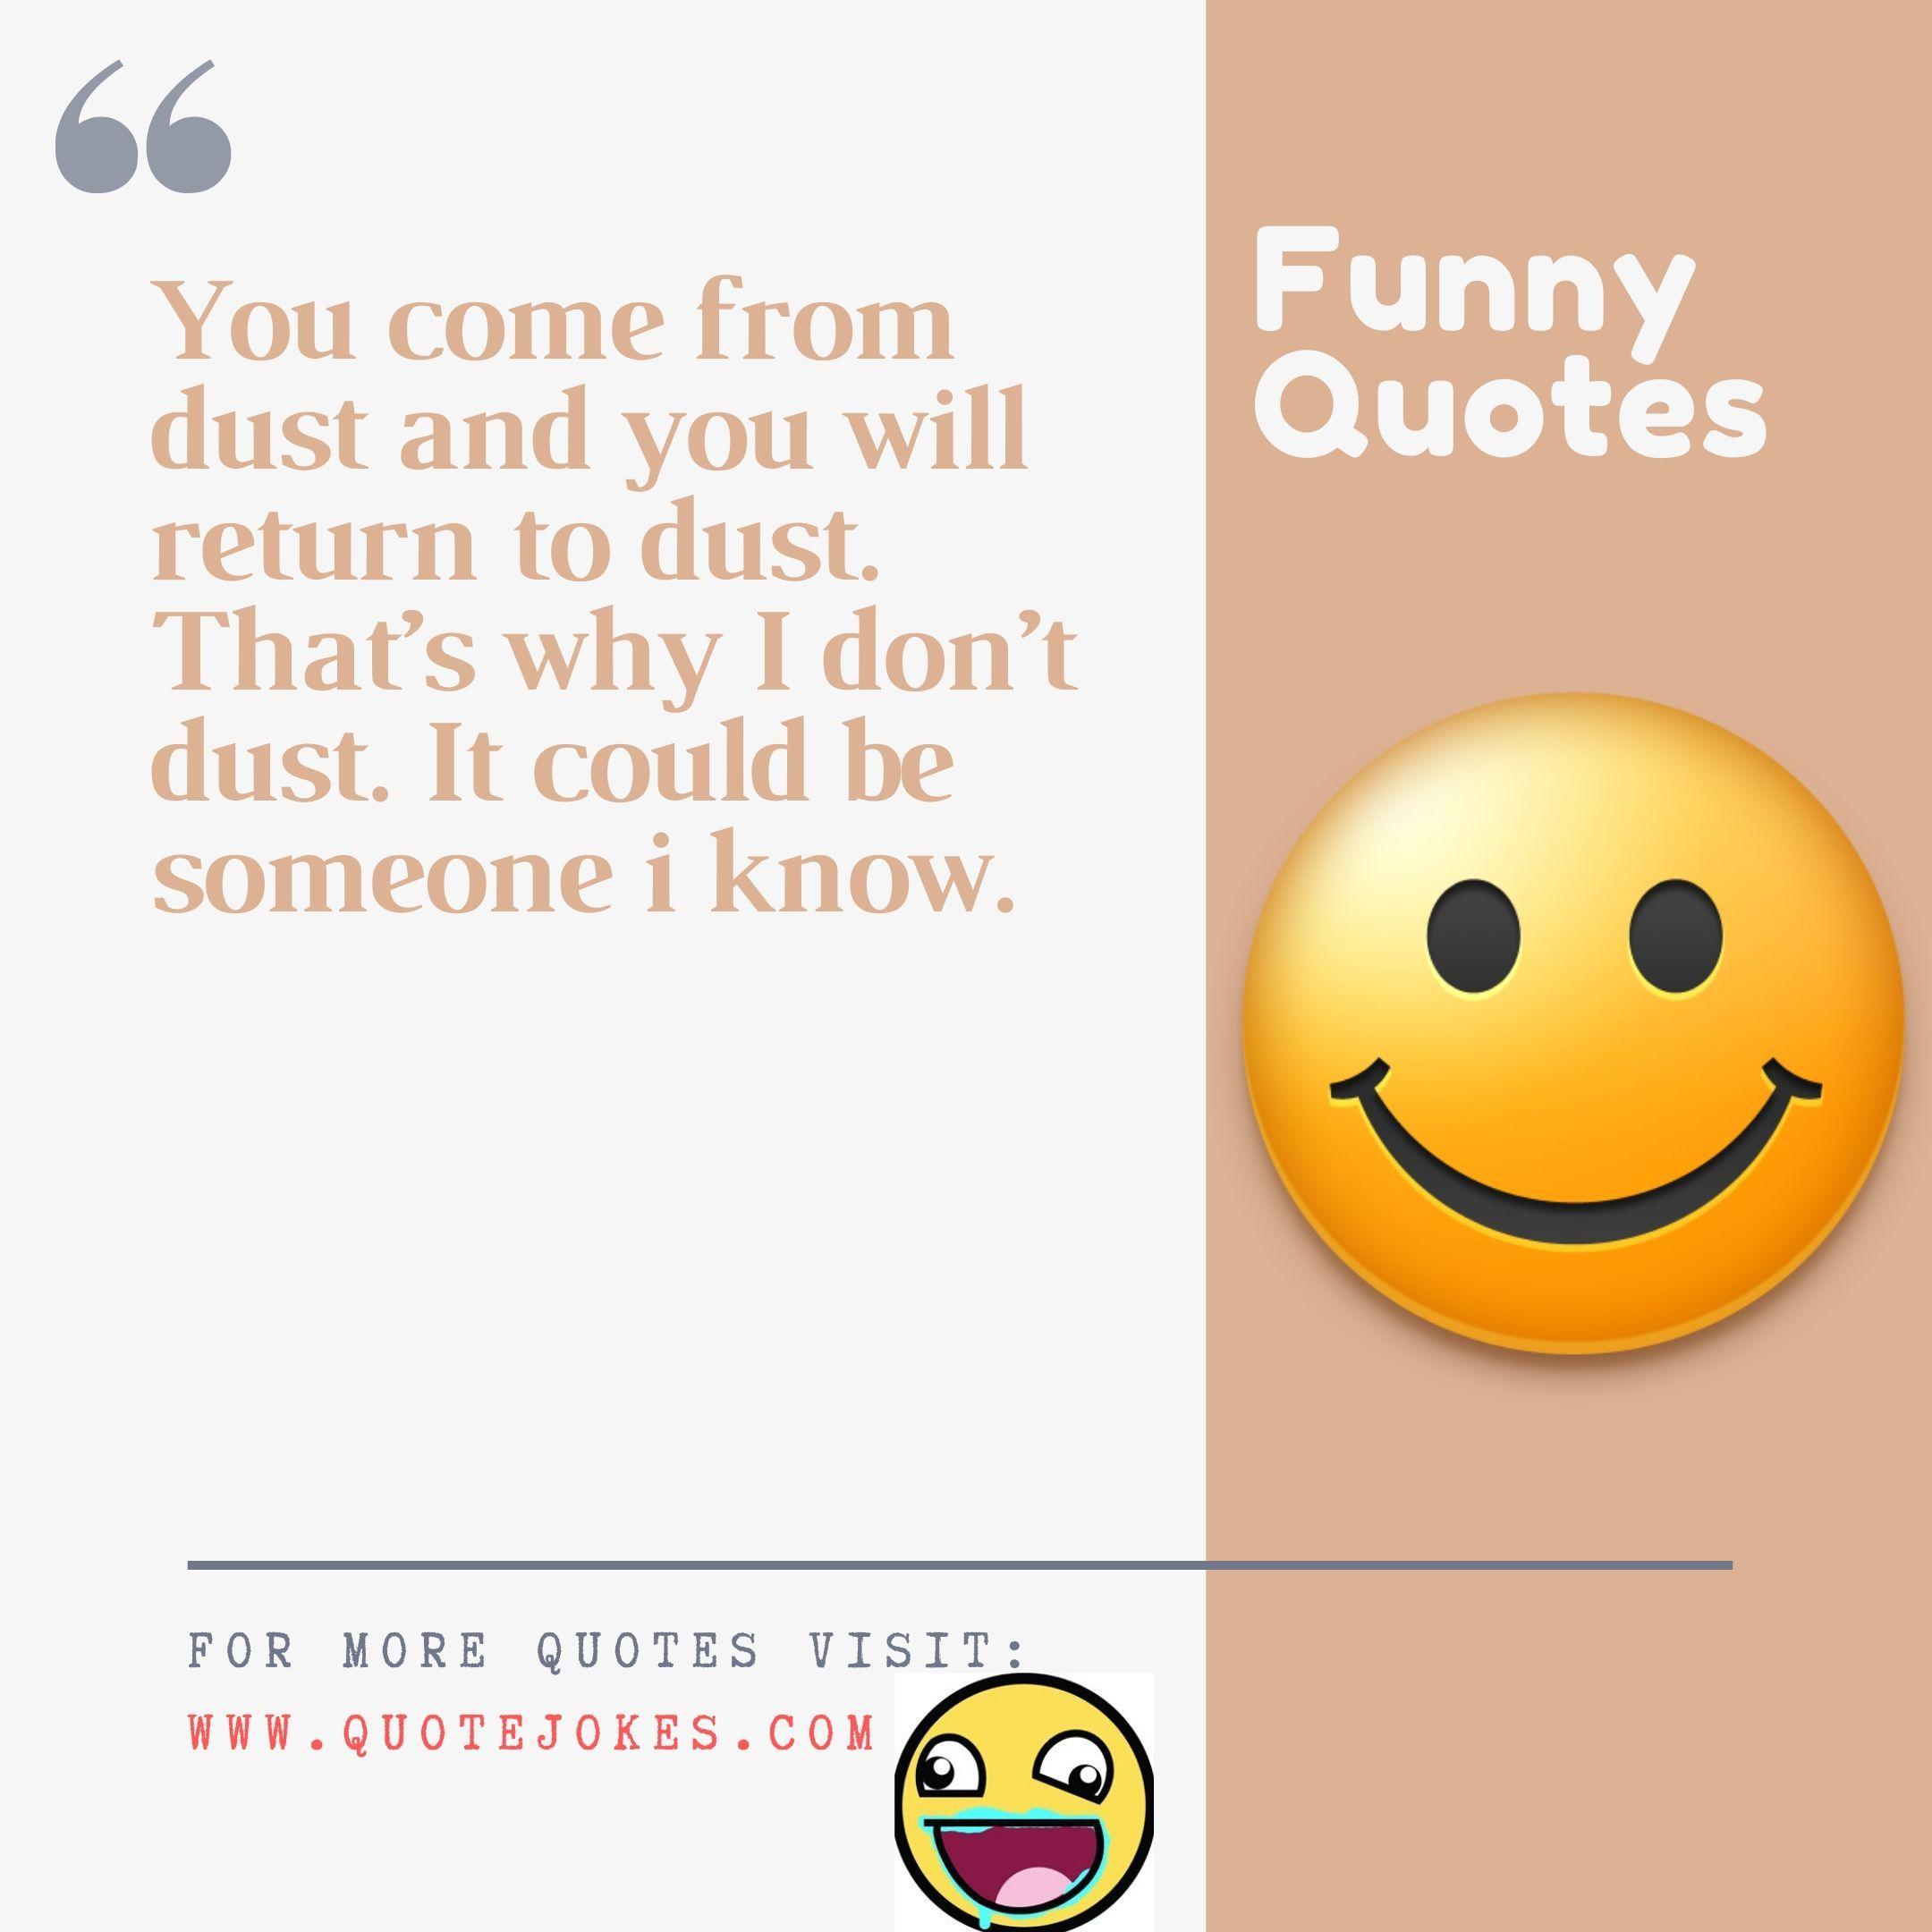 Funny Quotes Funny Quotes New Year Quotes Funny Hilarious Funny Quotes Sarcasm